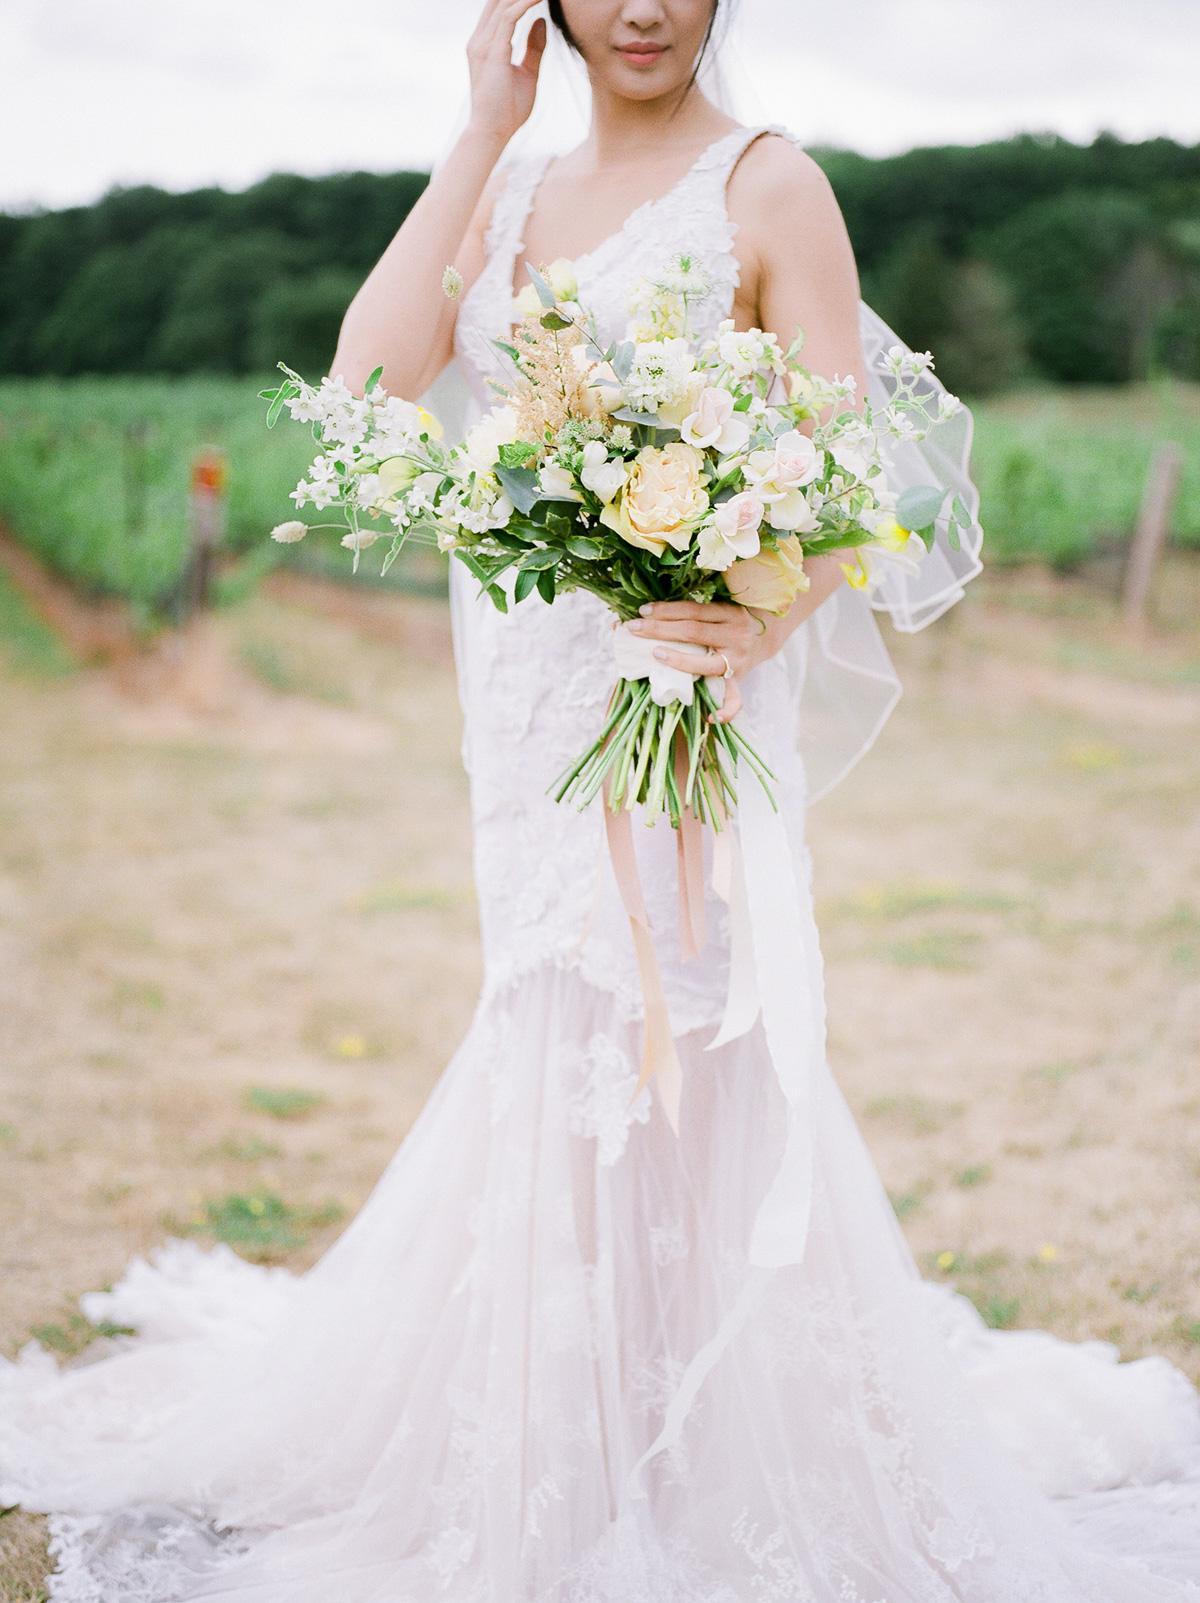 jennifer-xu-photography-vineyard-bride-swish-list-rosewod-eatstes-winery-beamsville-wedding-editorial-34.jpg